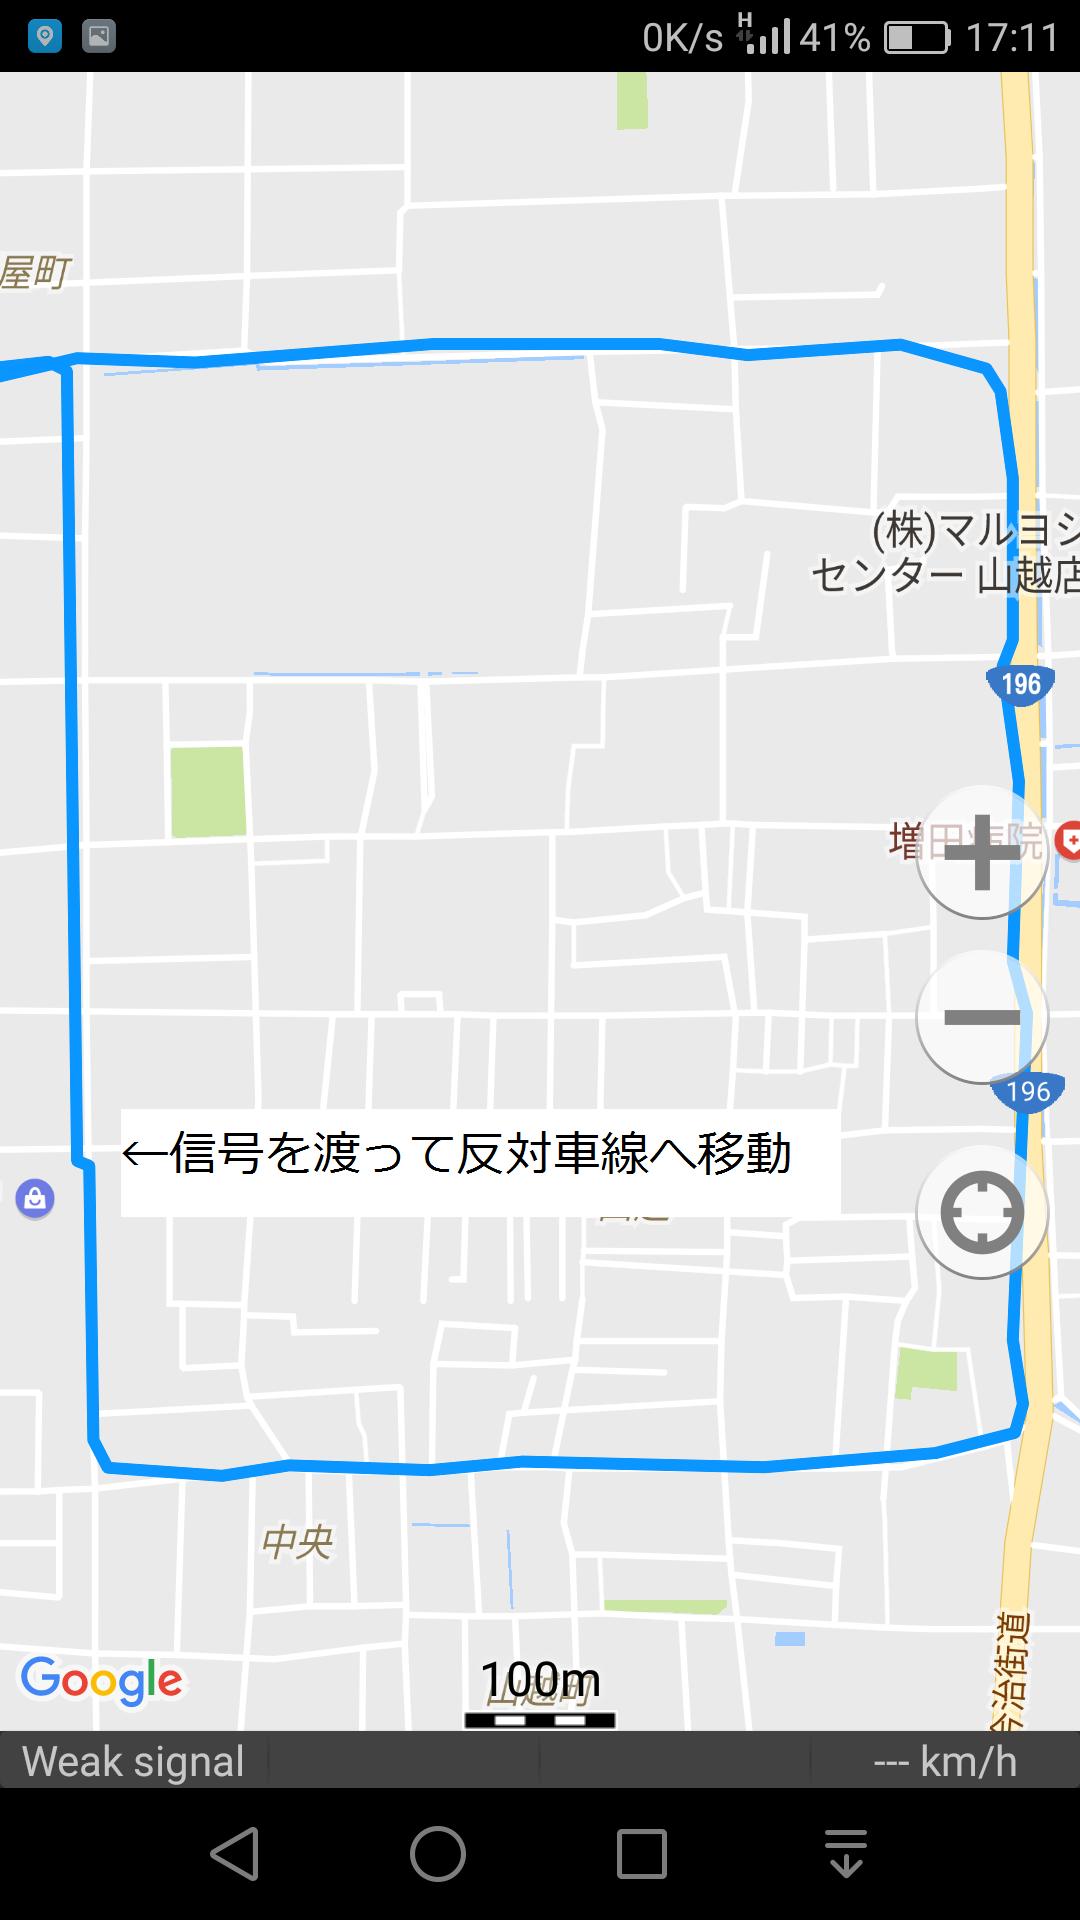 f:id:ukki0309:20170326150615p:plain